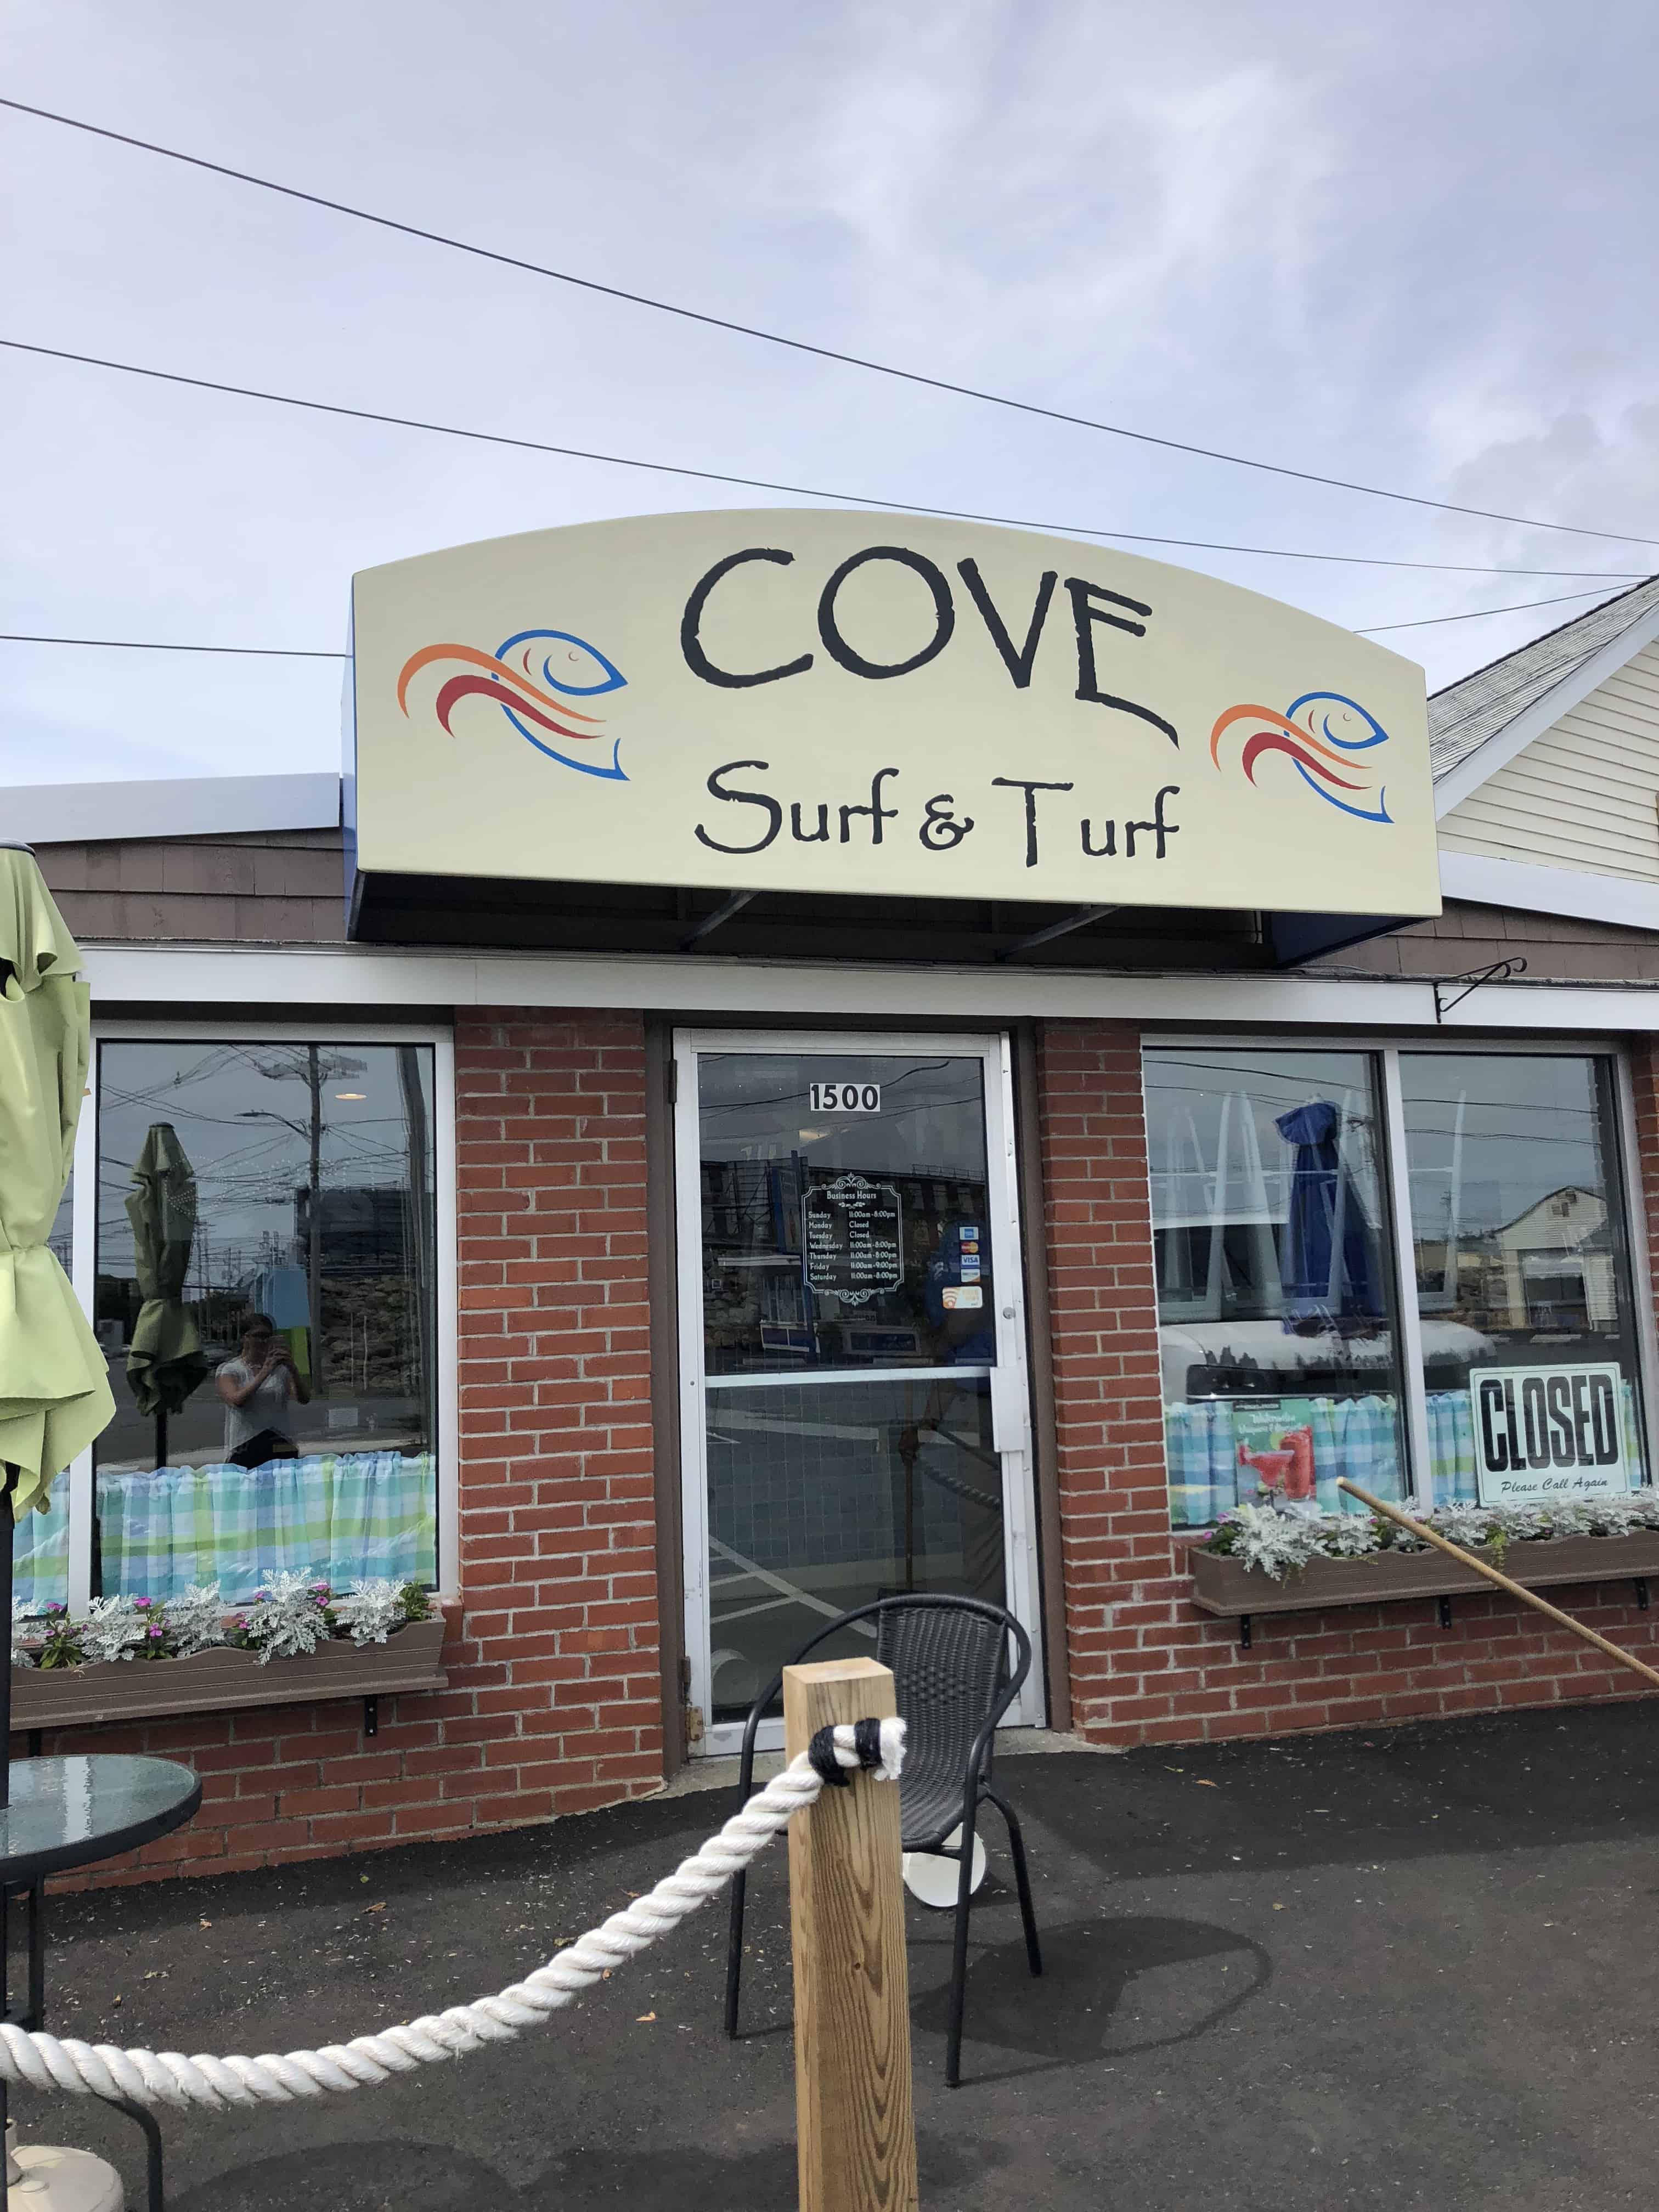 Cove Surf & Turf